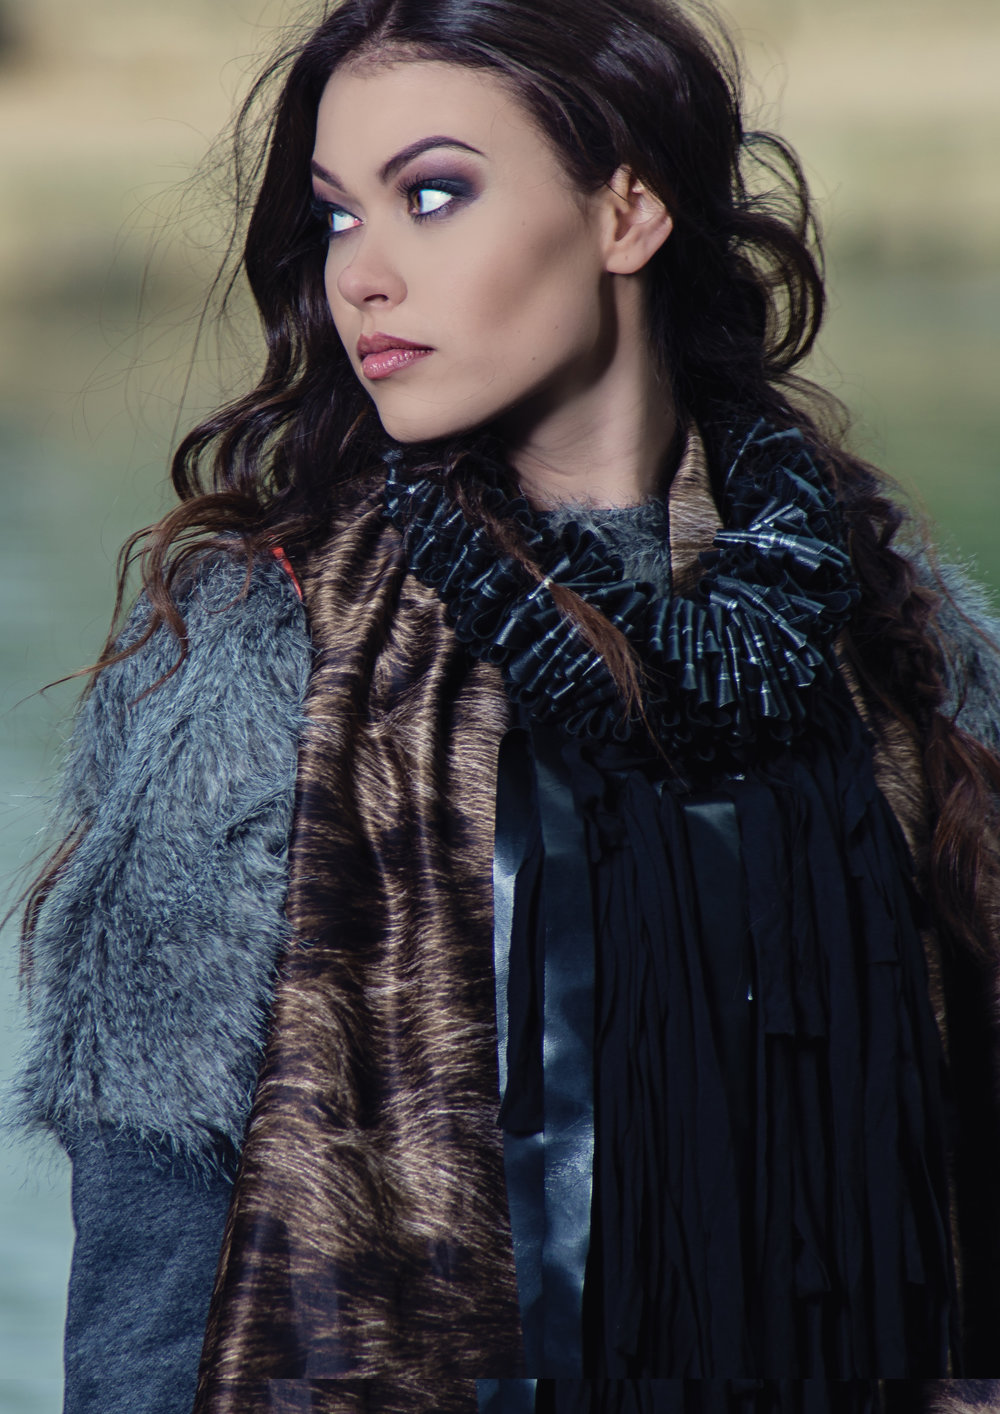 zaramia-ava-zaramiaava-leeds-fashion-designer-ethical-sustainable-tailored-minimalist-jacket-accent-coat-jacket-print-shirt-top-versatile-drape-cowl-styling-shop-womenswear-models-photoshoot-colour-5